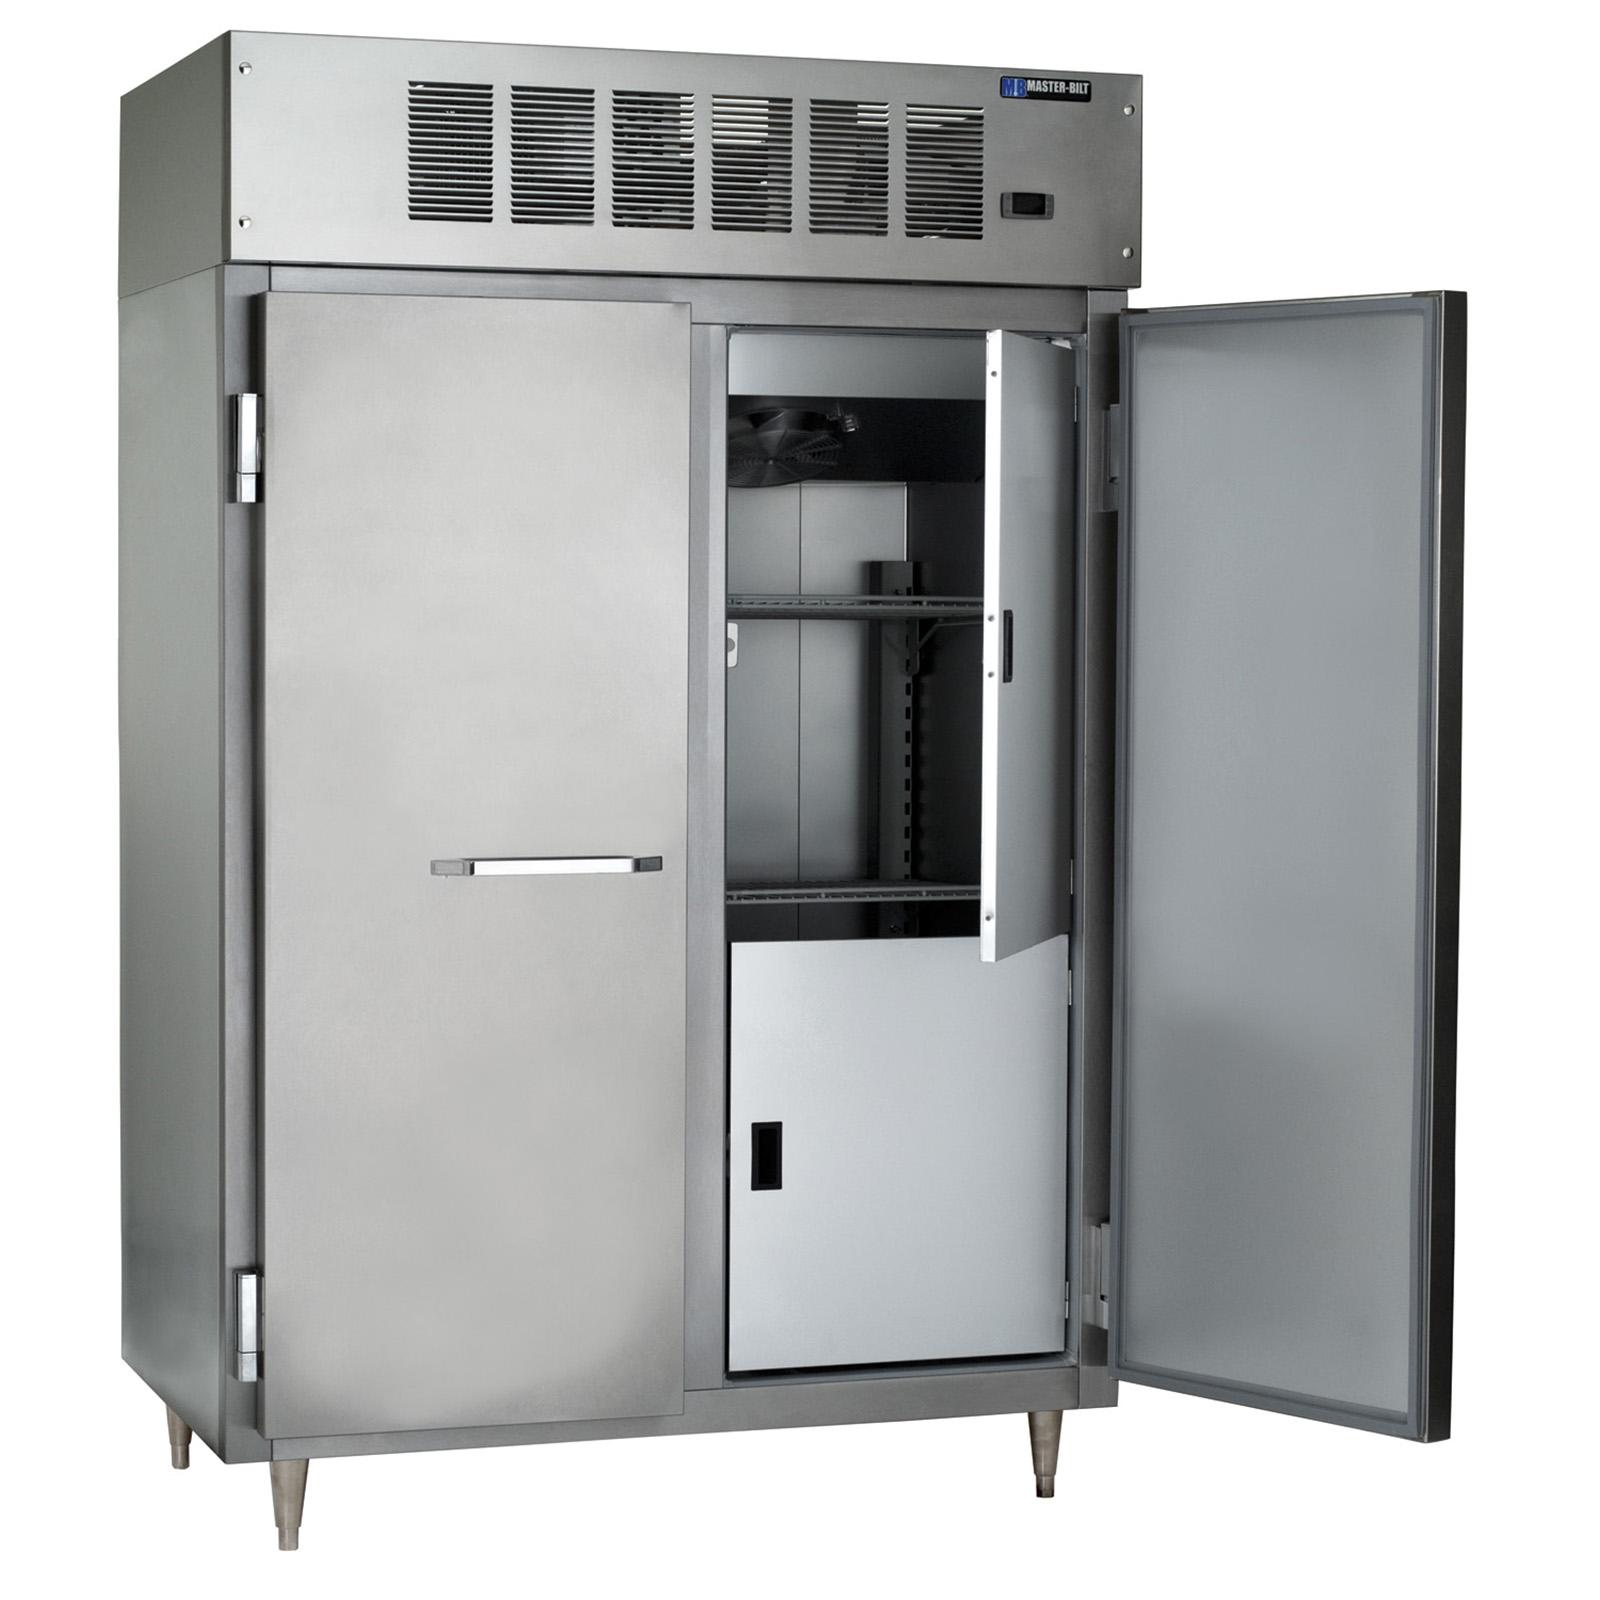 Master-Bilt Products IHC-48R ice cream hardening cabinet